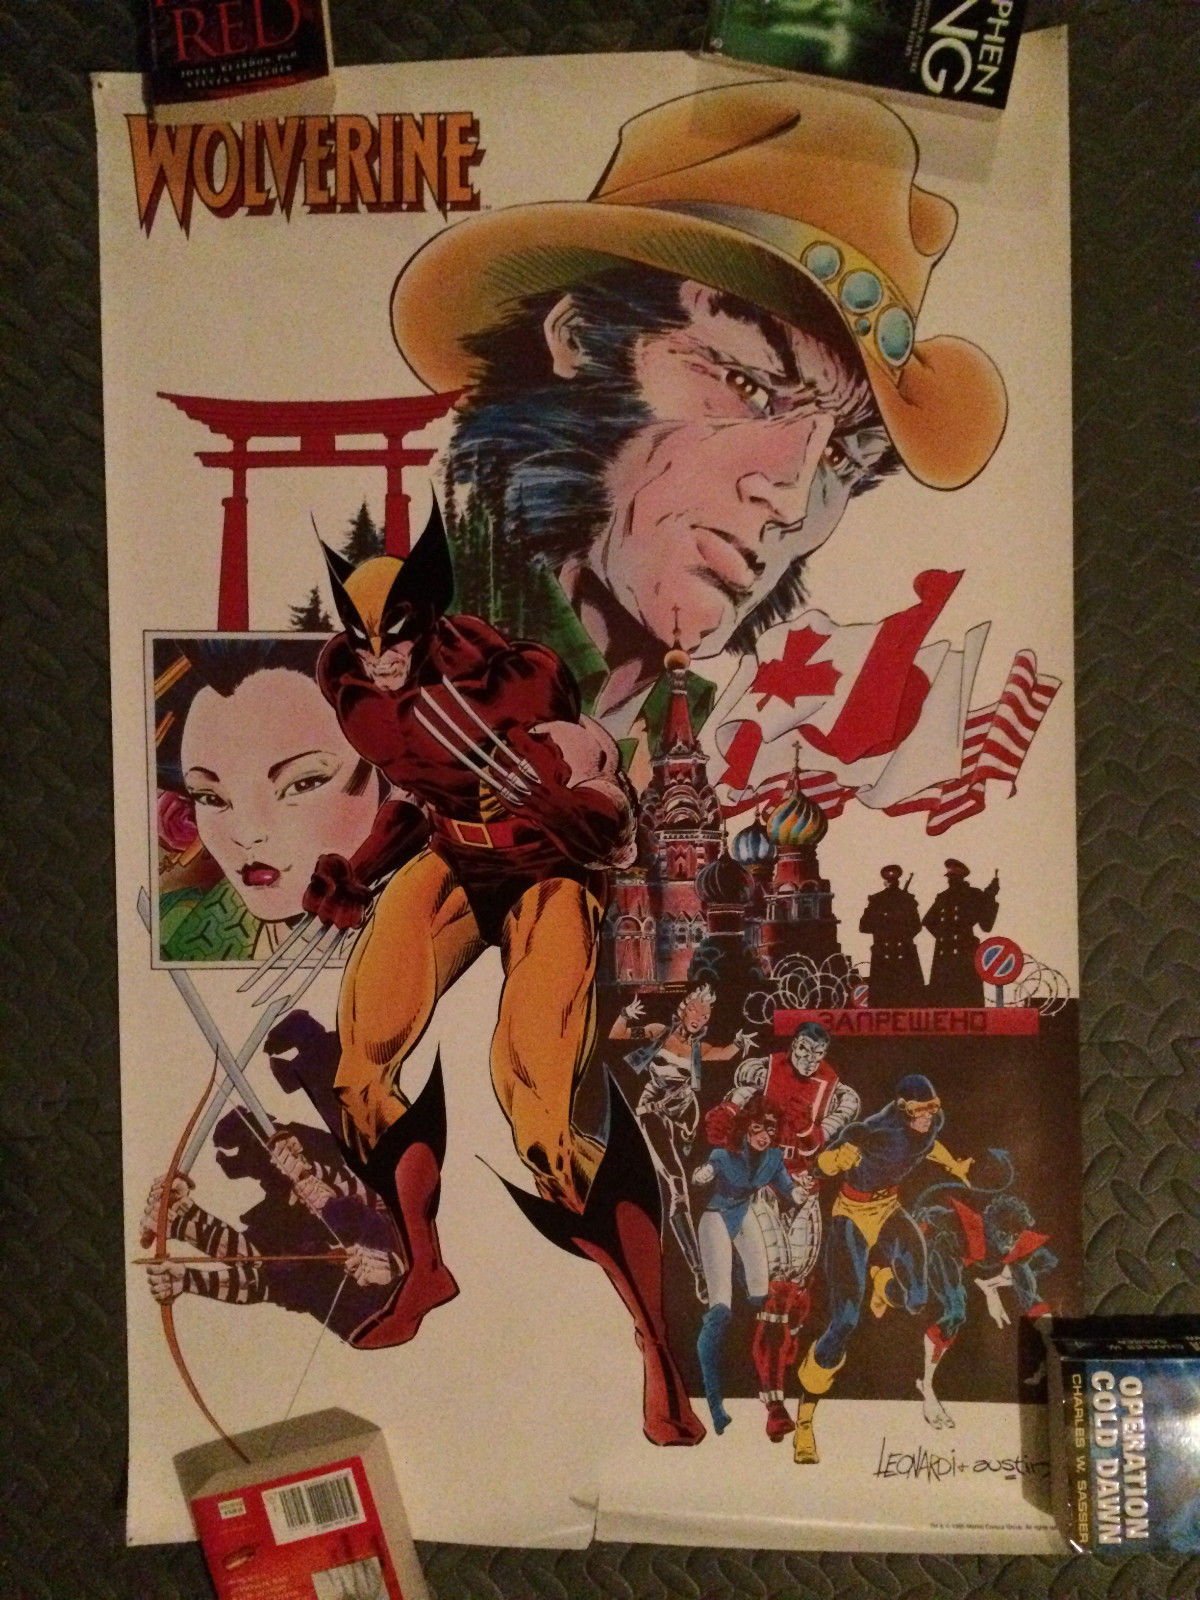 Rick Leonardi Wolverine poster